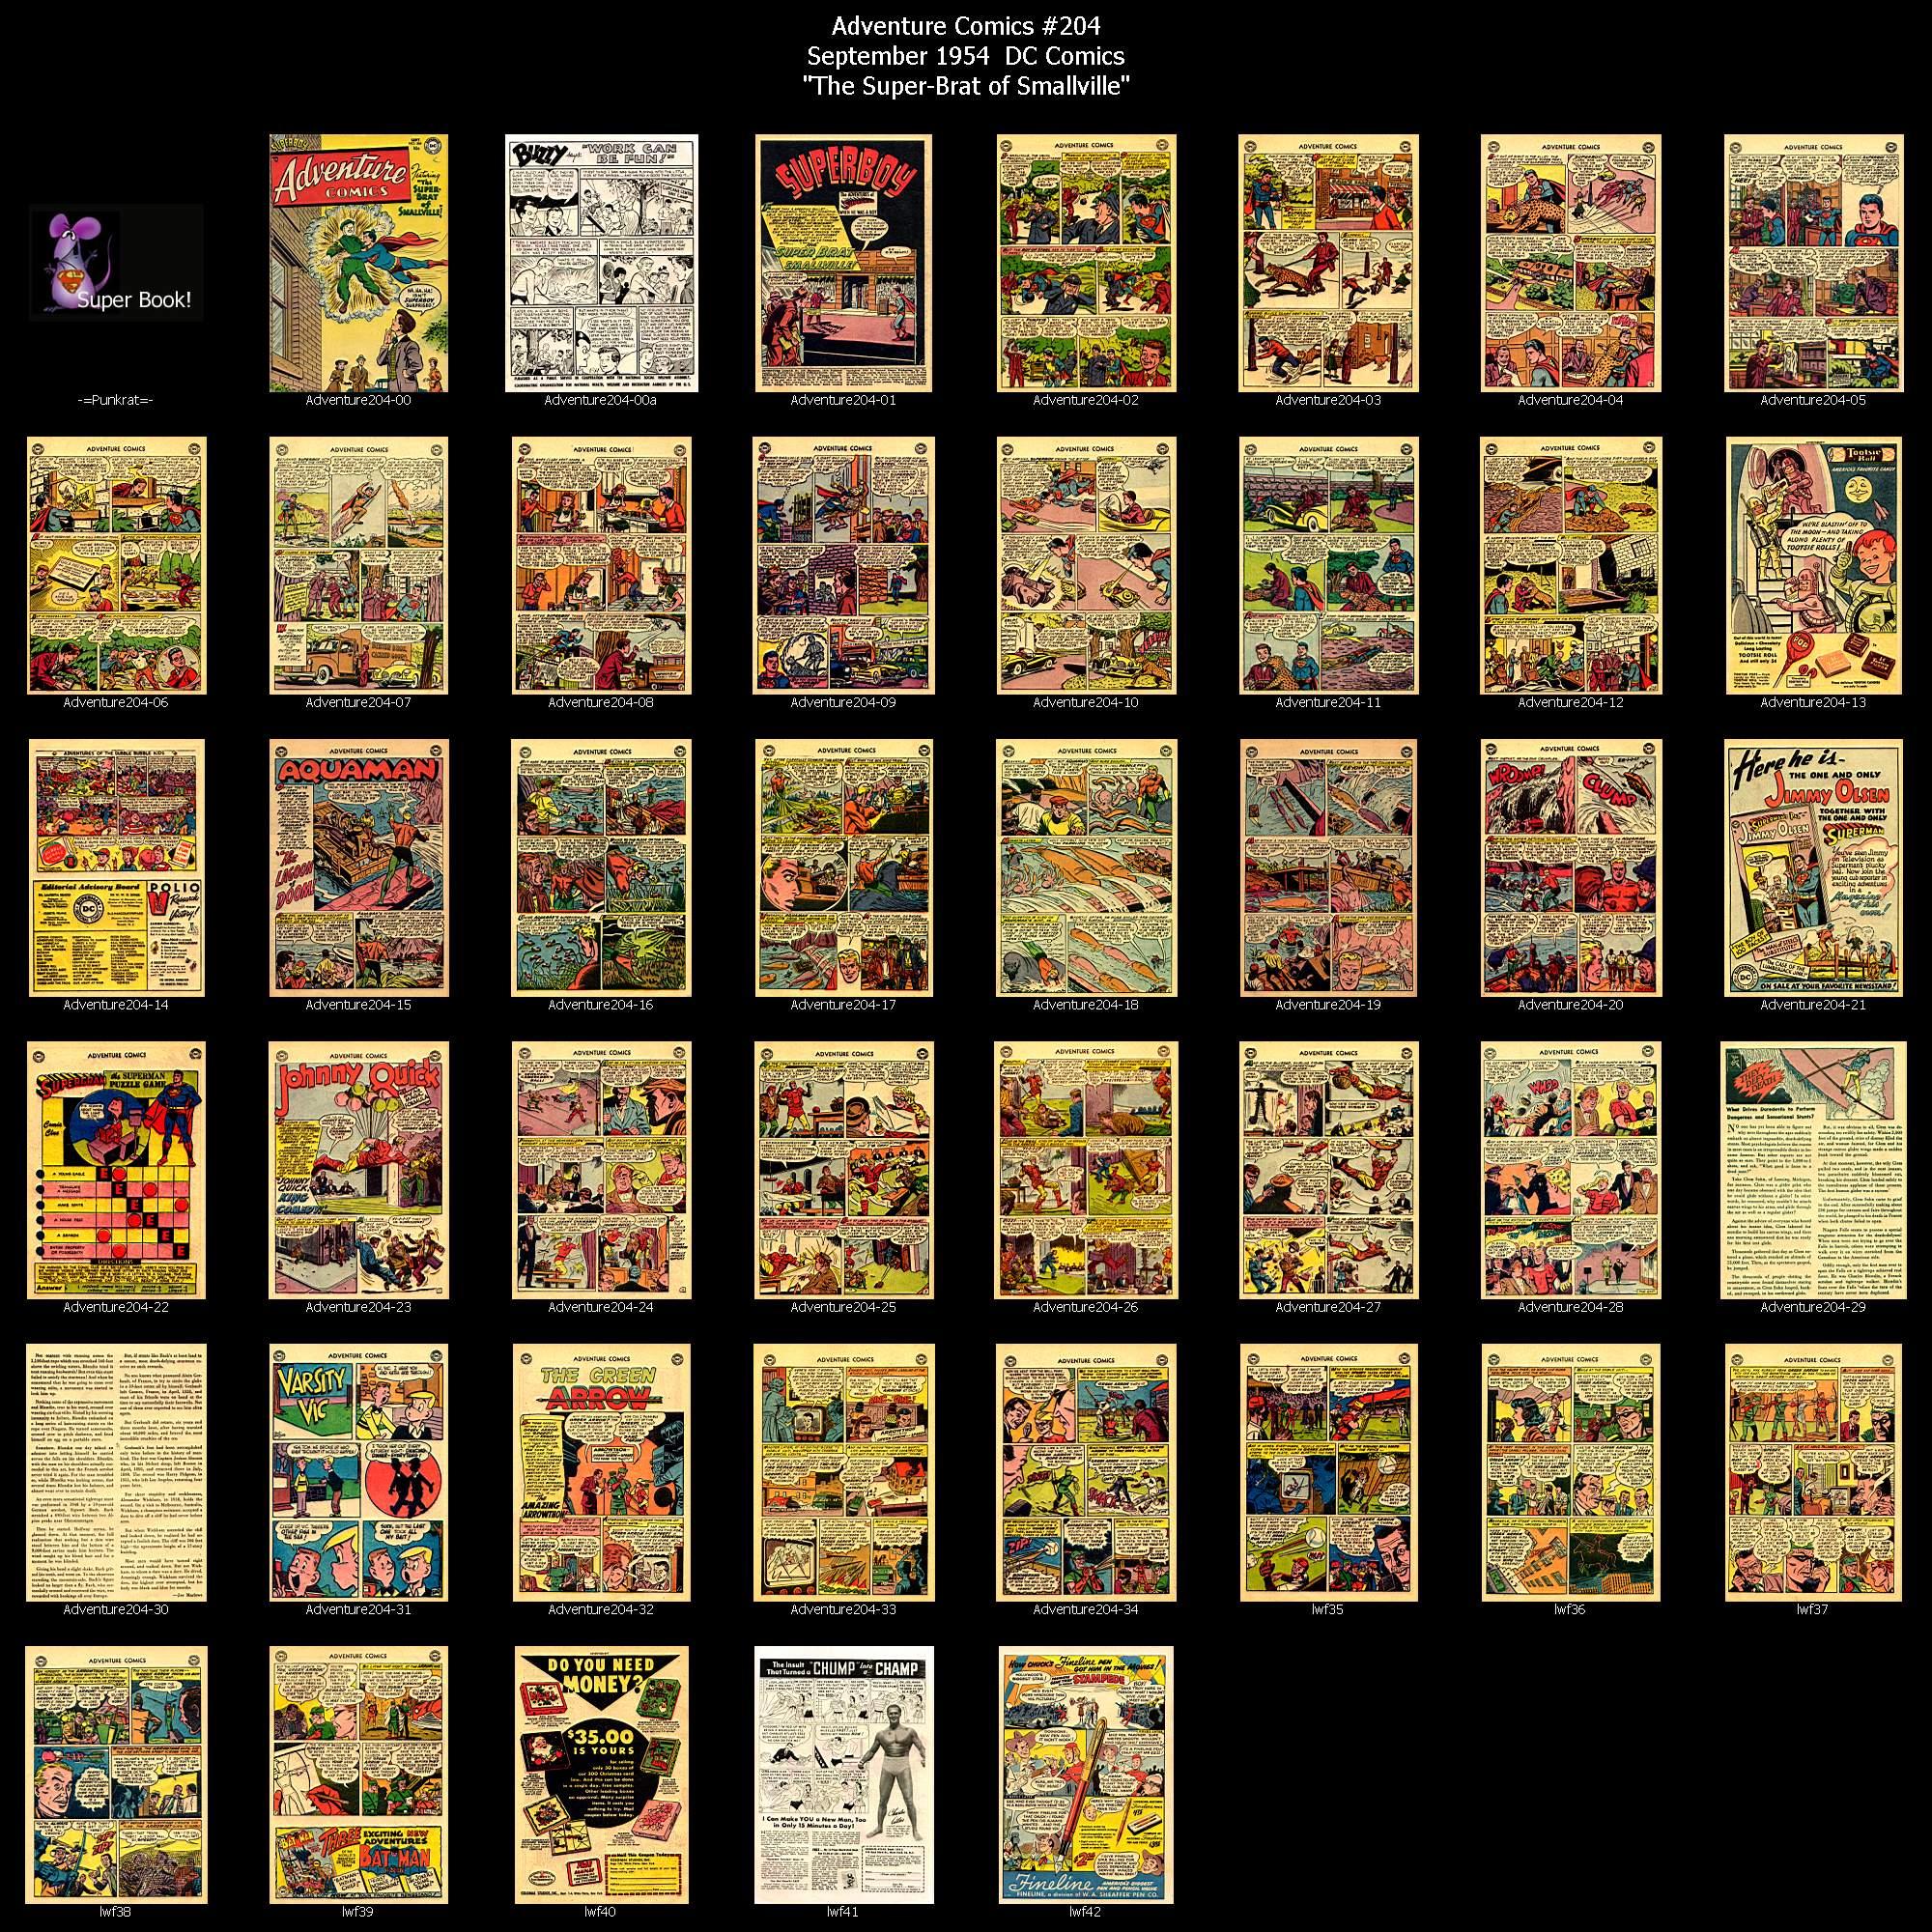 Read online Adventure Comics (1938) comic -  Issue #204 - 45